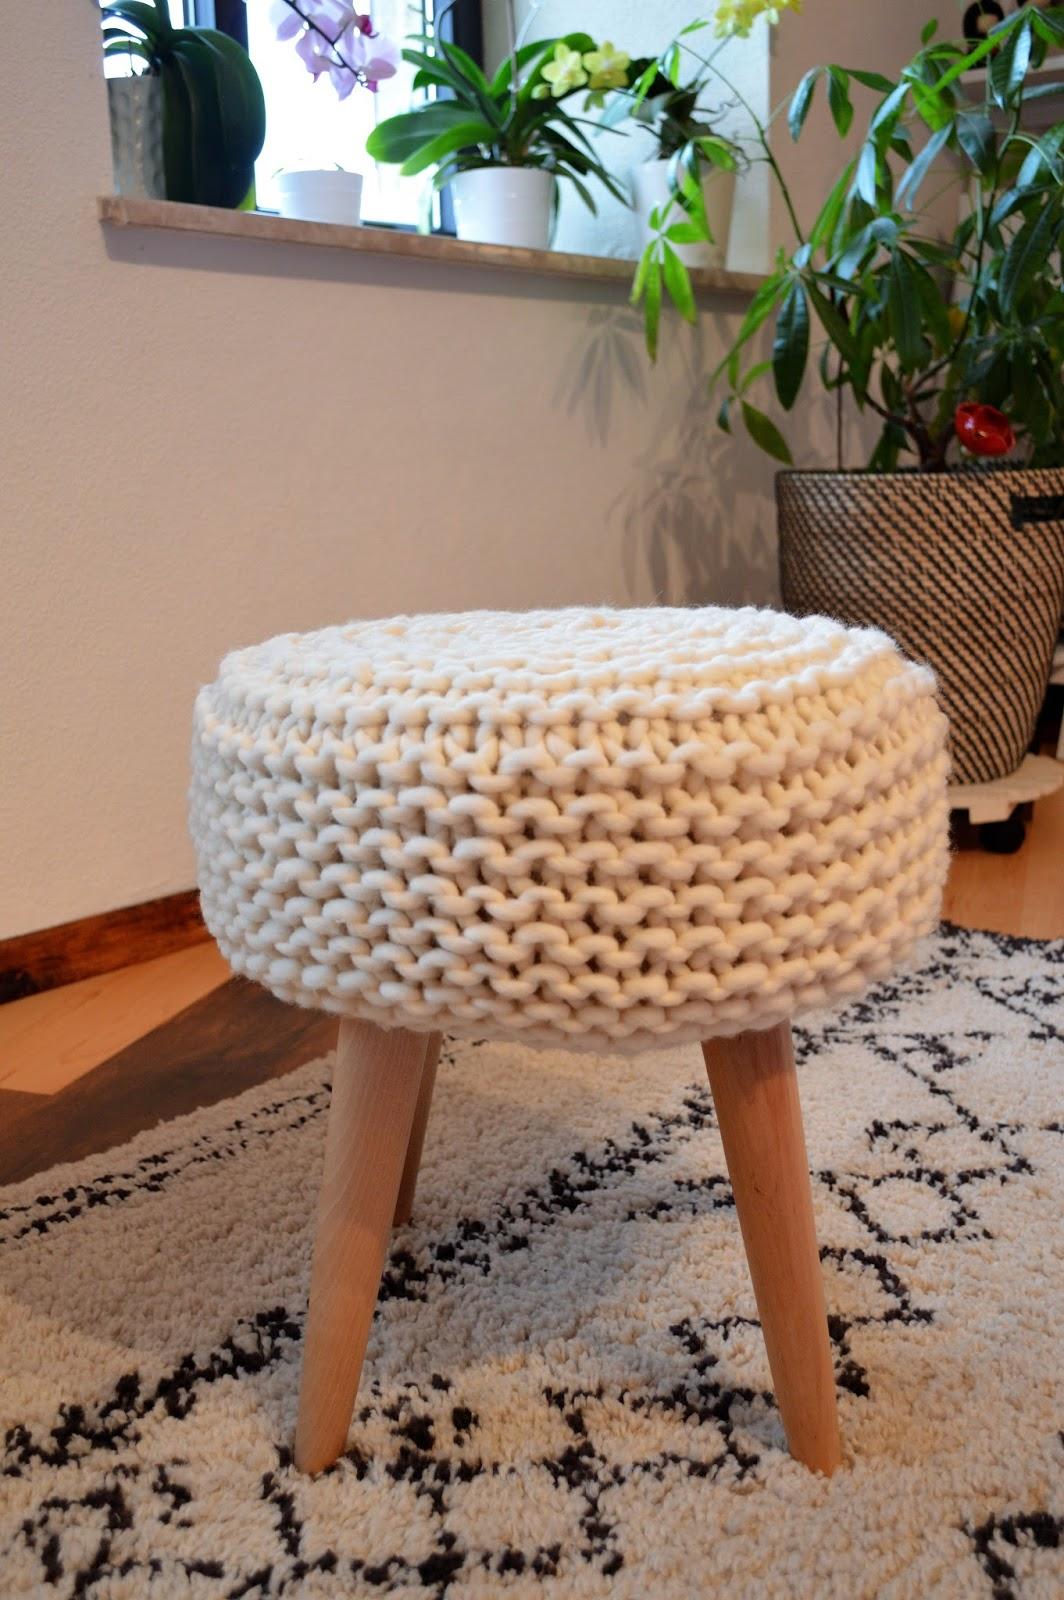 f e du tricot customiser un tabouret avec du tricot tuto inside. Black Bedroom Furniture Sets. Home Design Ideas